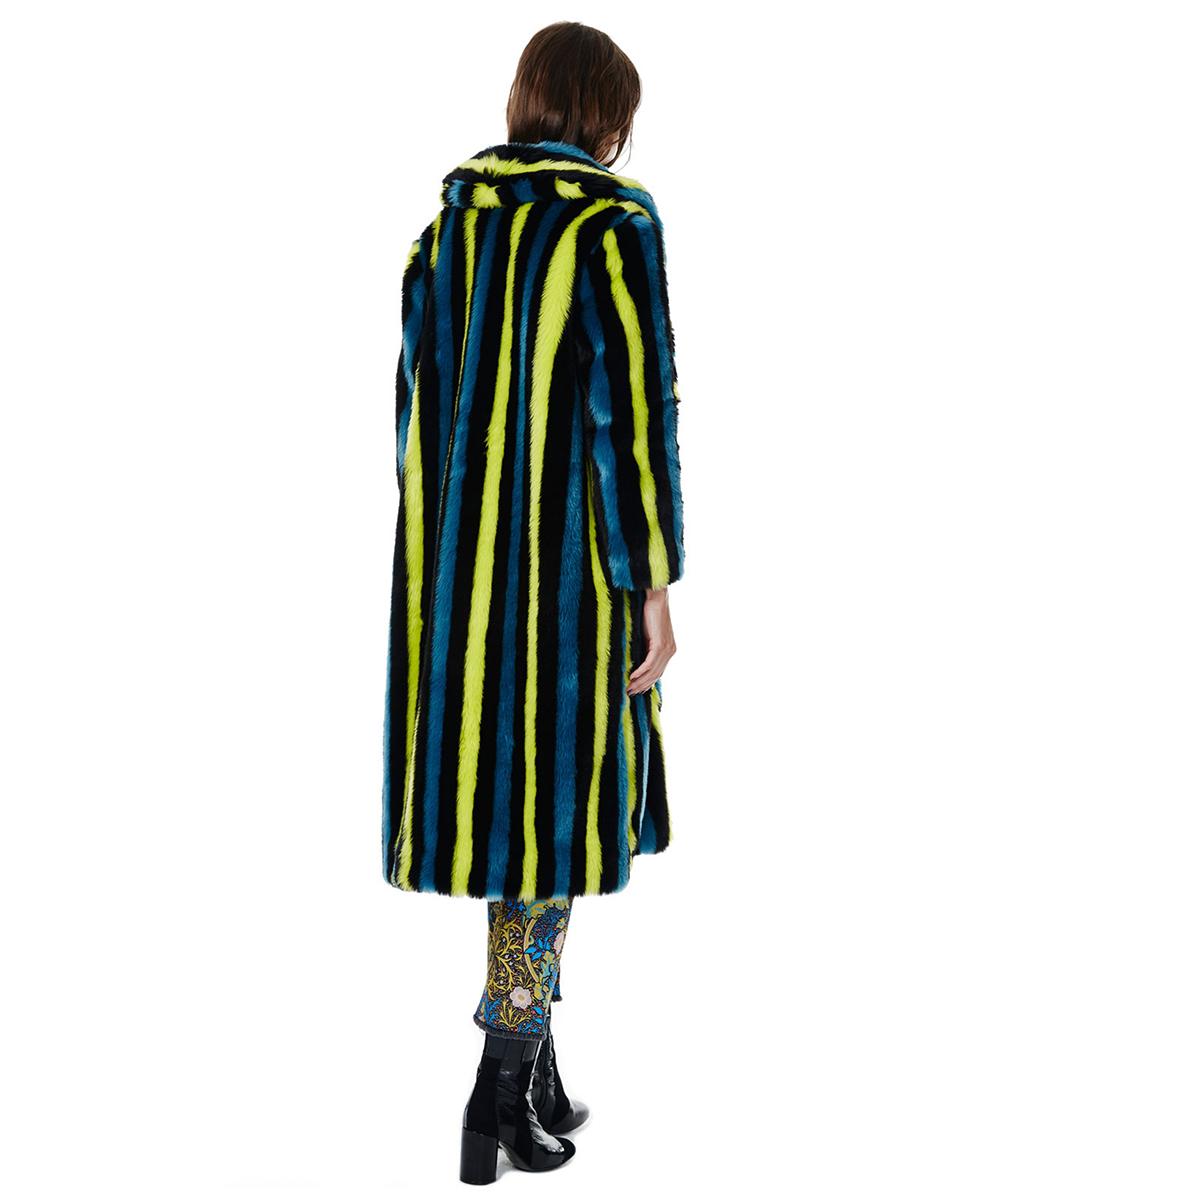 Green Stripe Portia Coat  by House of Hackney